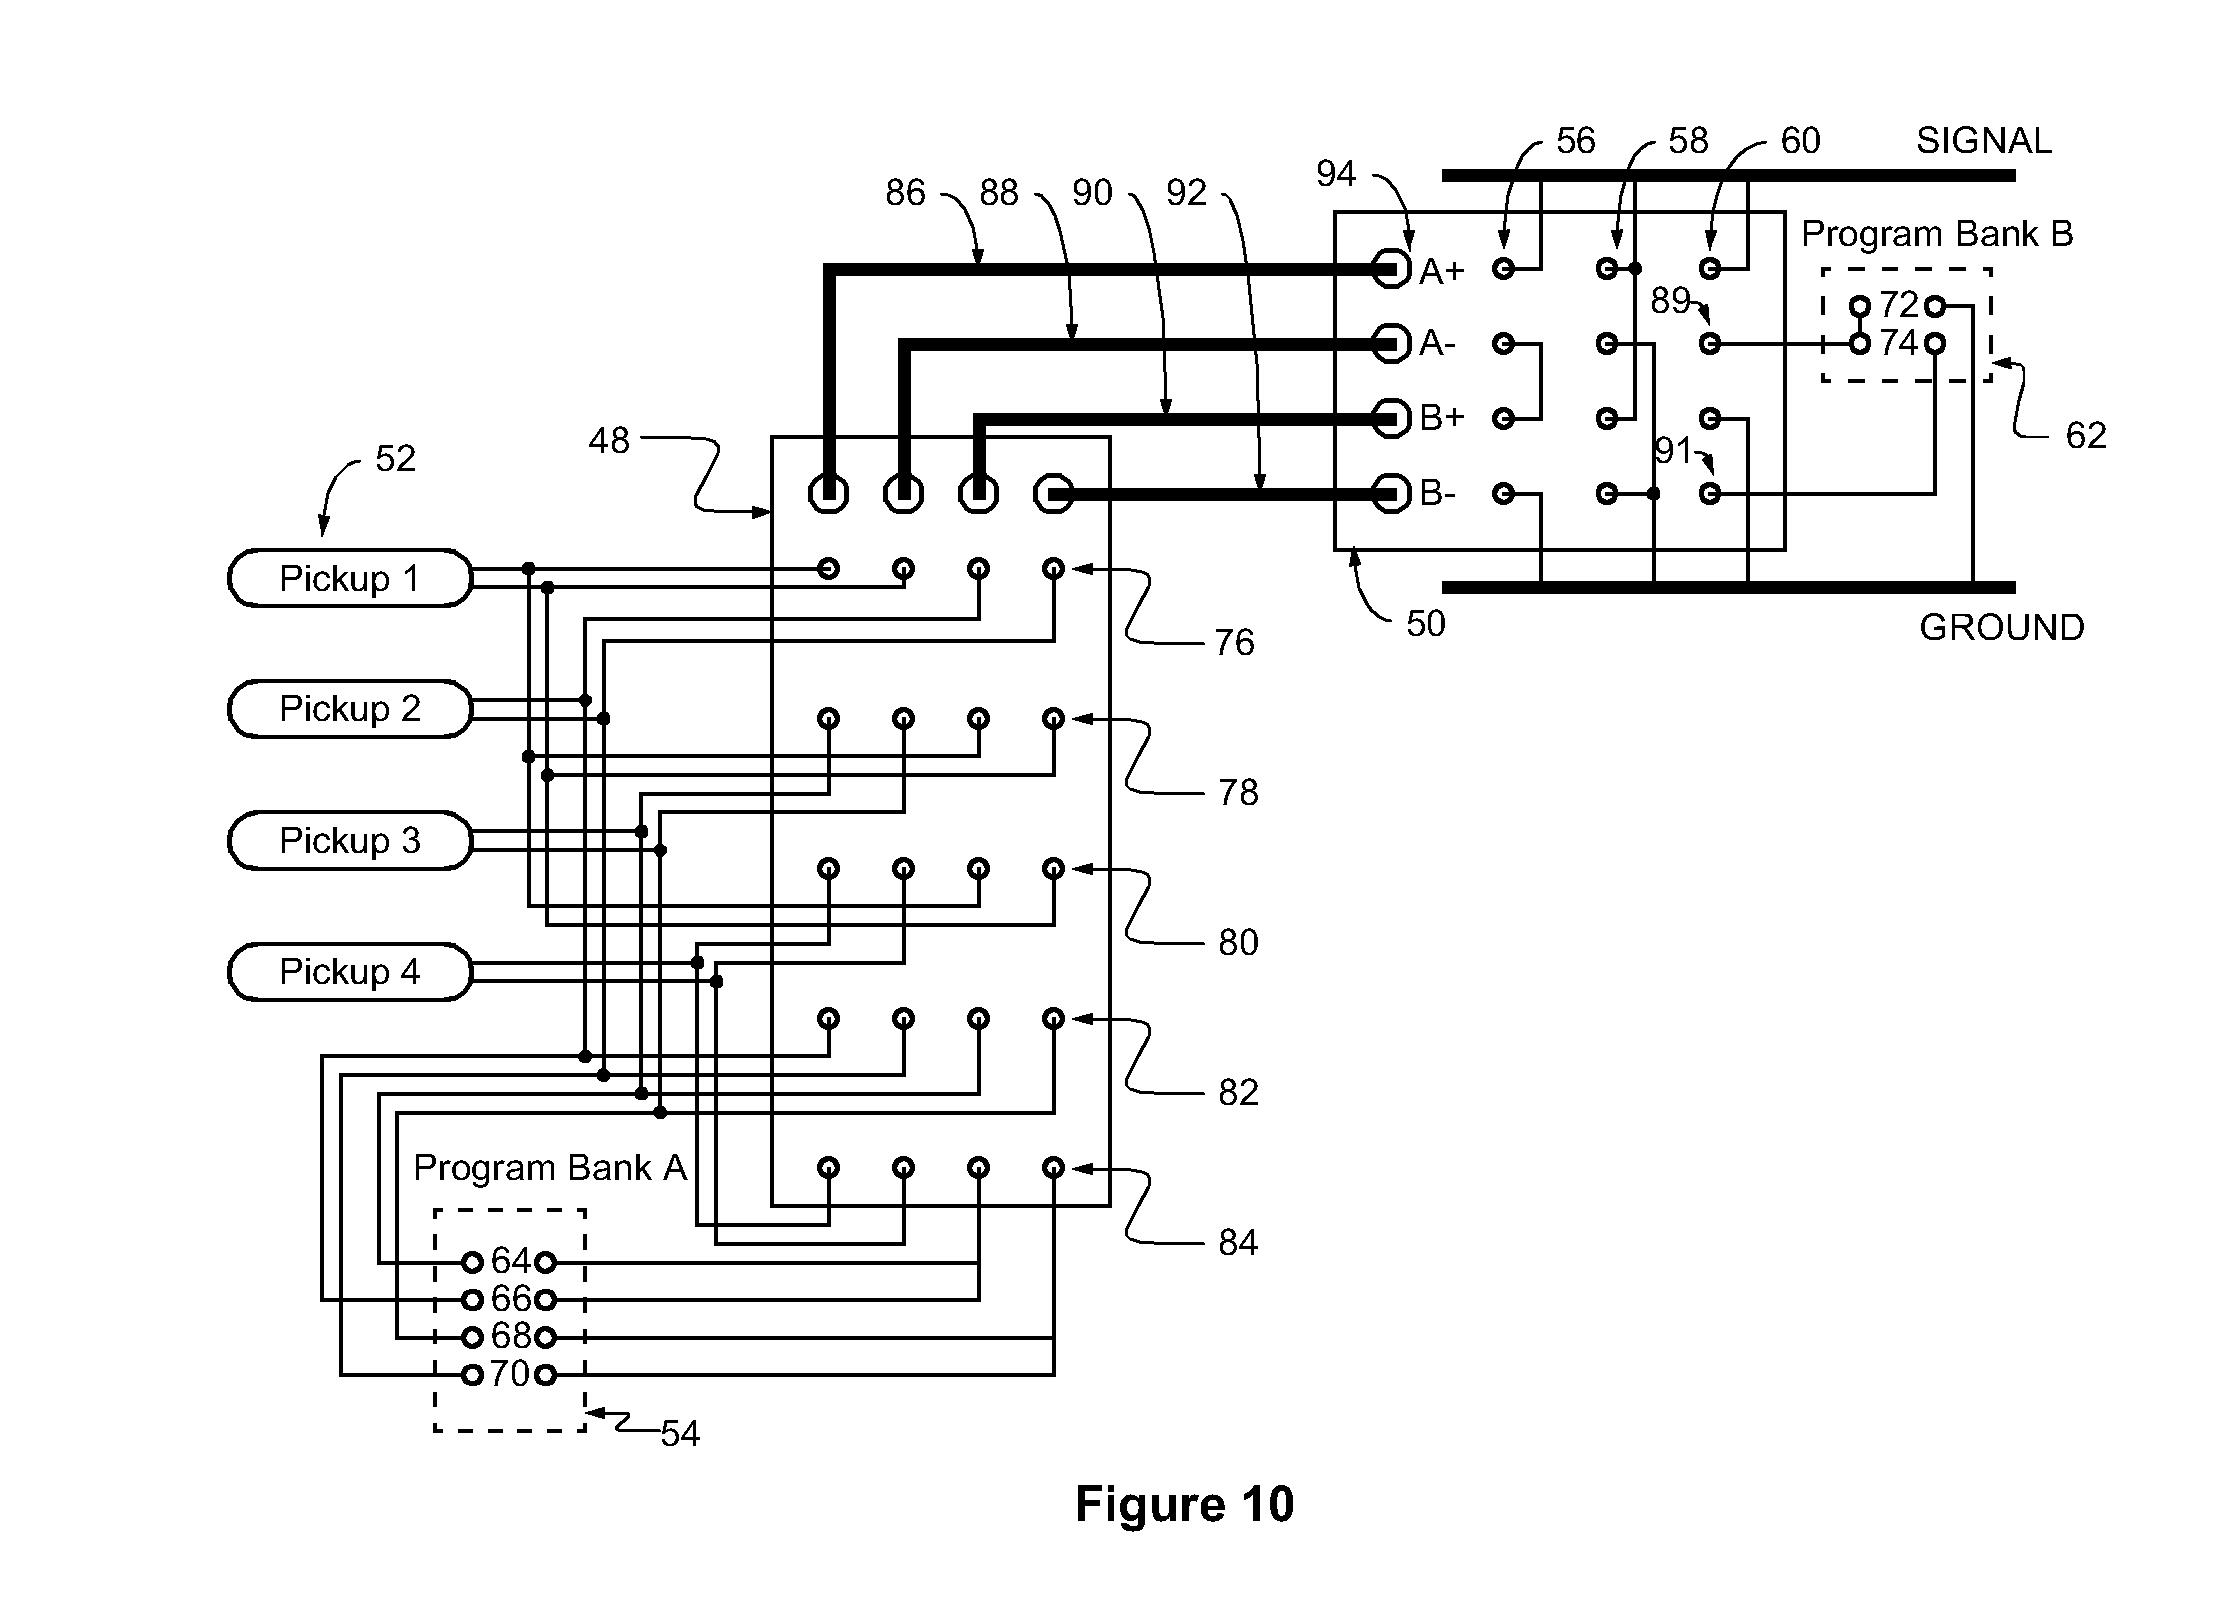 tom anderson wiring diagram wiring diagram database u2022 rh itgenergy co Light Switch Wiring Diagram Wiring Diagram Symbols